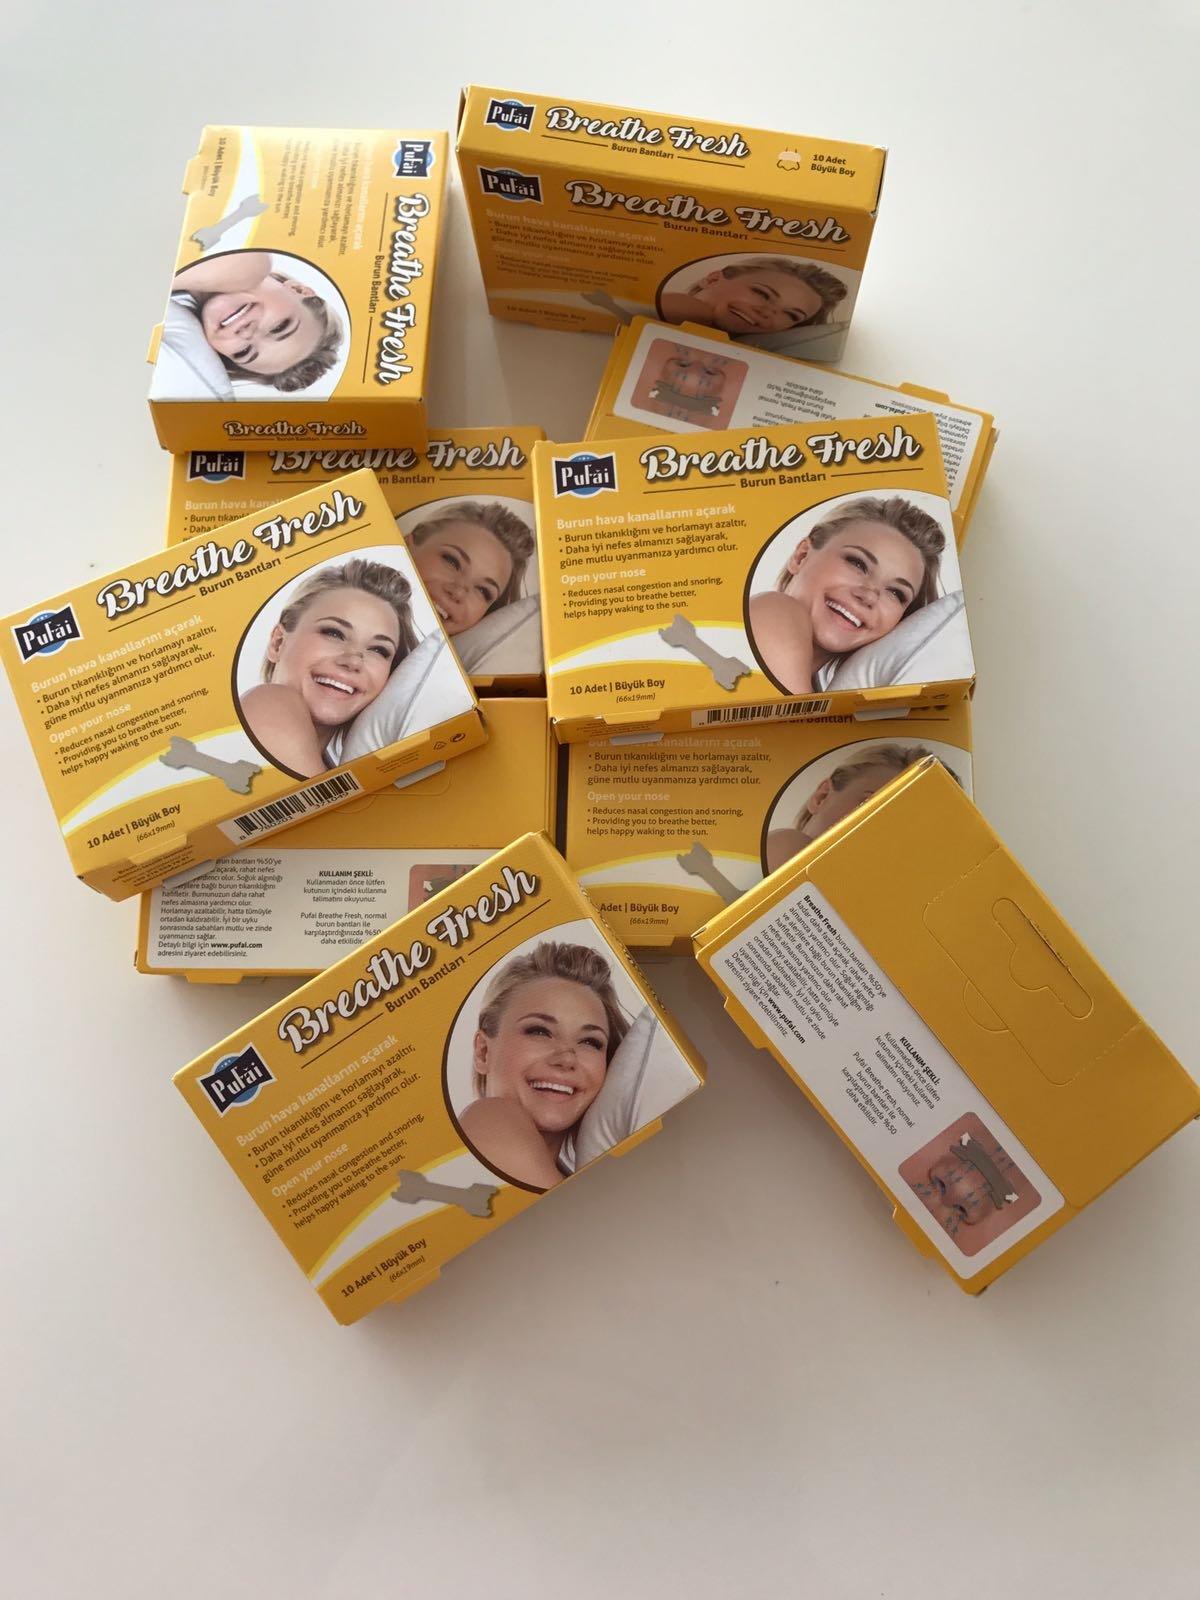 Pufai Breathe Fresh Nasal Strips Large Size 66x19 mm , 500 Pieces ( 50 Box * 10 Pcs ) Large Size Nasal Strips by Pufai by Pufai